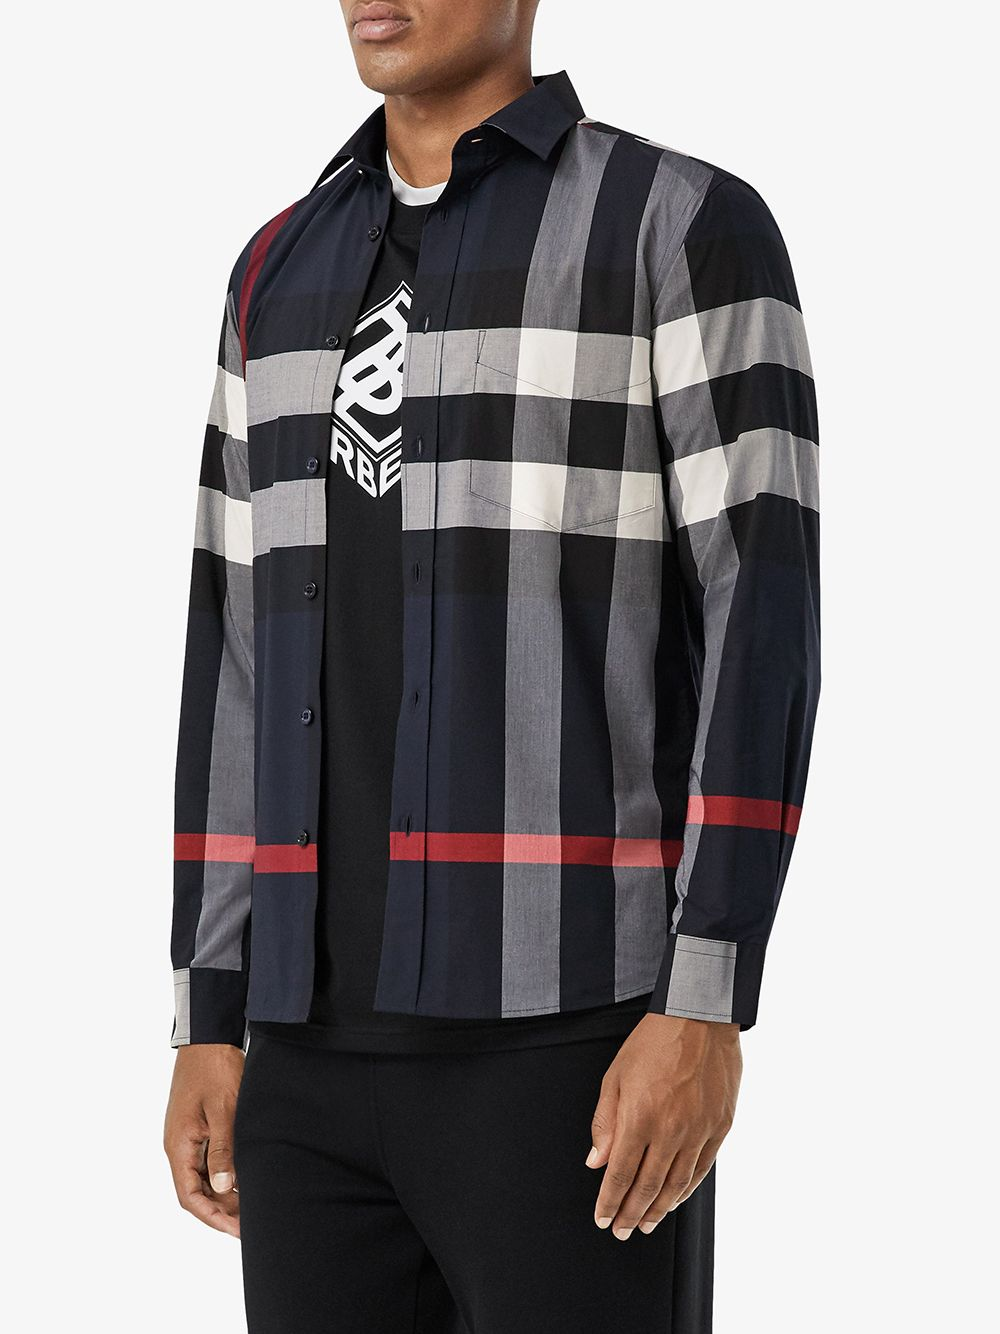 blue slim-fit shirt in stretch cotton poplin  BURBERRY |  | 8018111-SOMERTONA1960